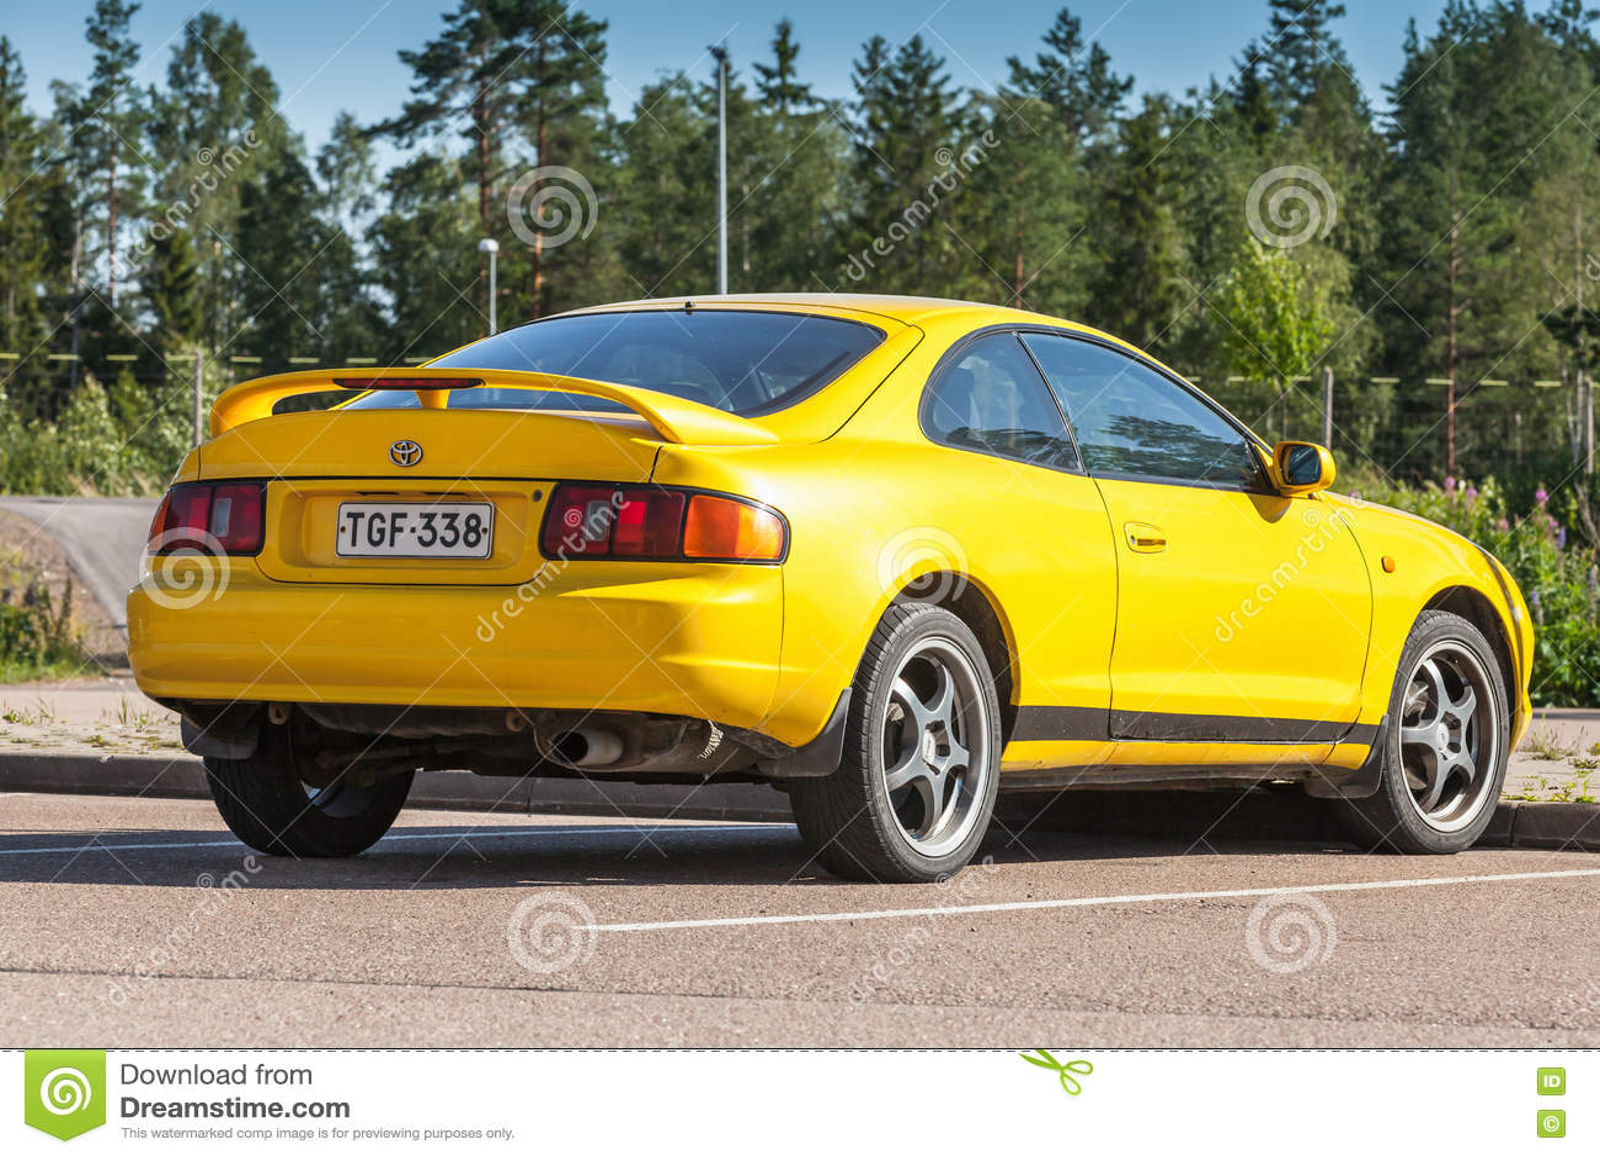 Toyota Celica 2016 >> Toyota Celica Gt Liftback T200 Model Editorial Image Image